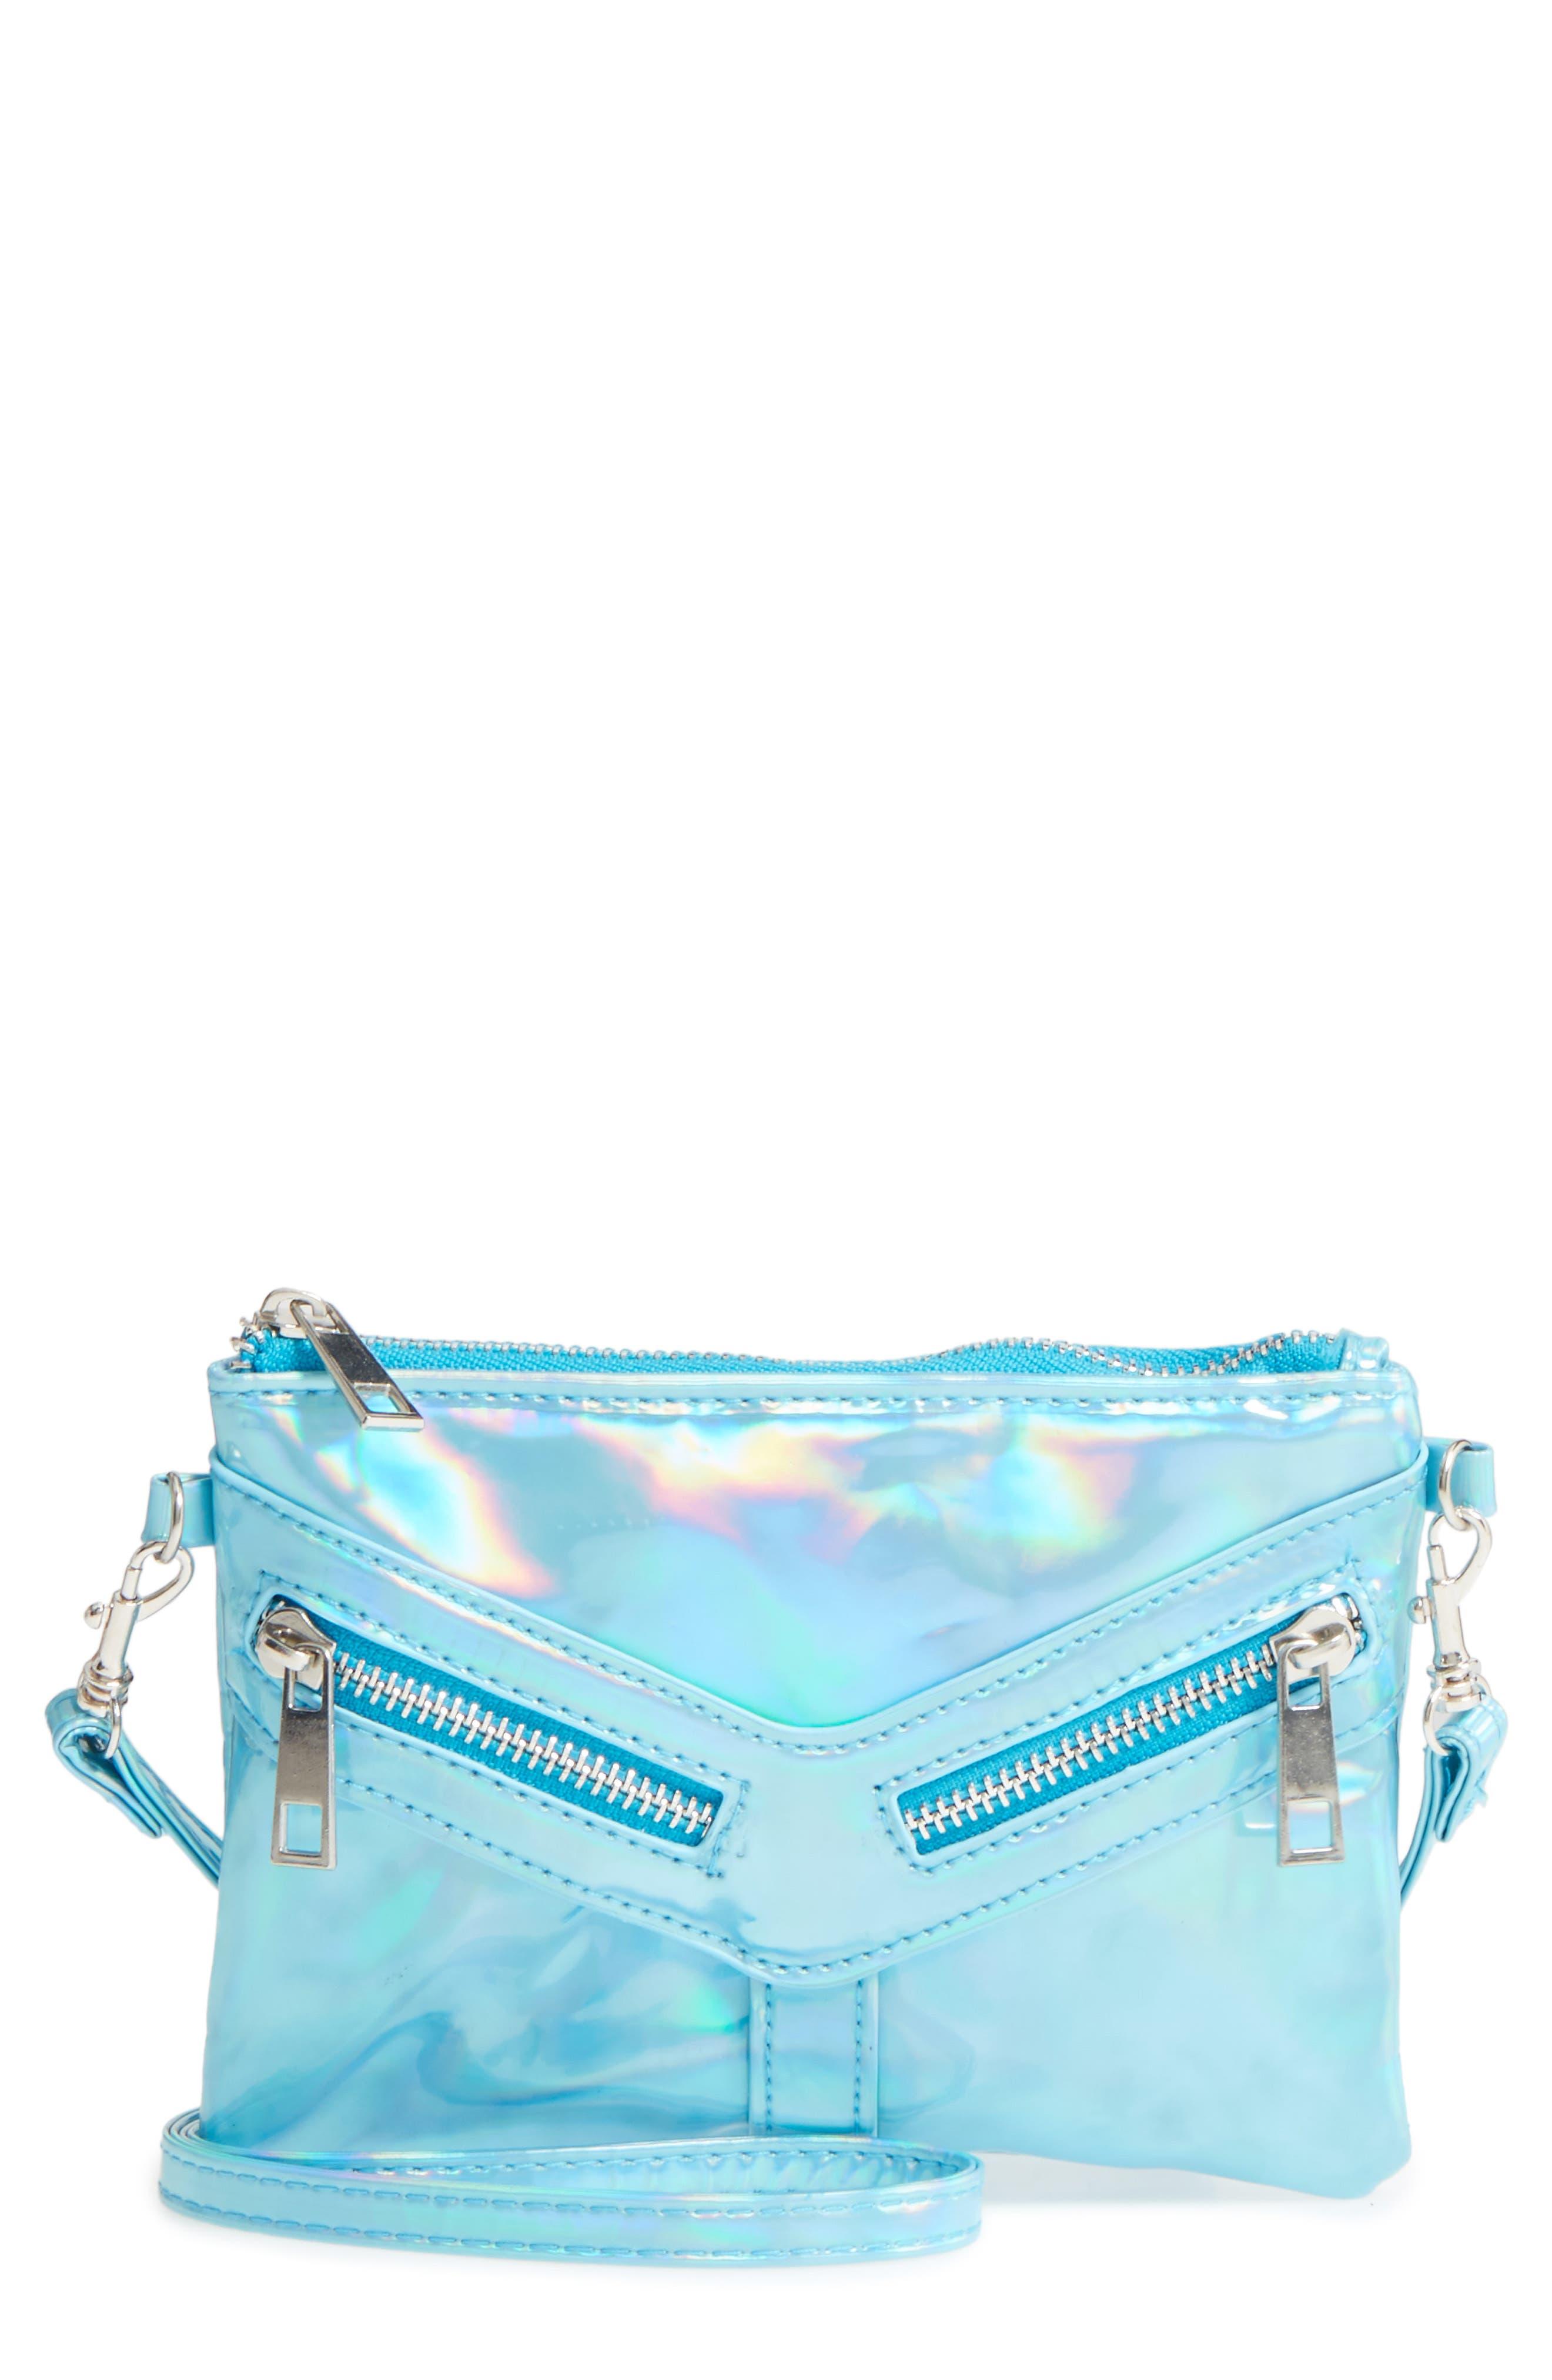 Capelli of New York Hologram Crossbody Bag,                             Main thumbnail 1, color,                             401